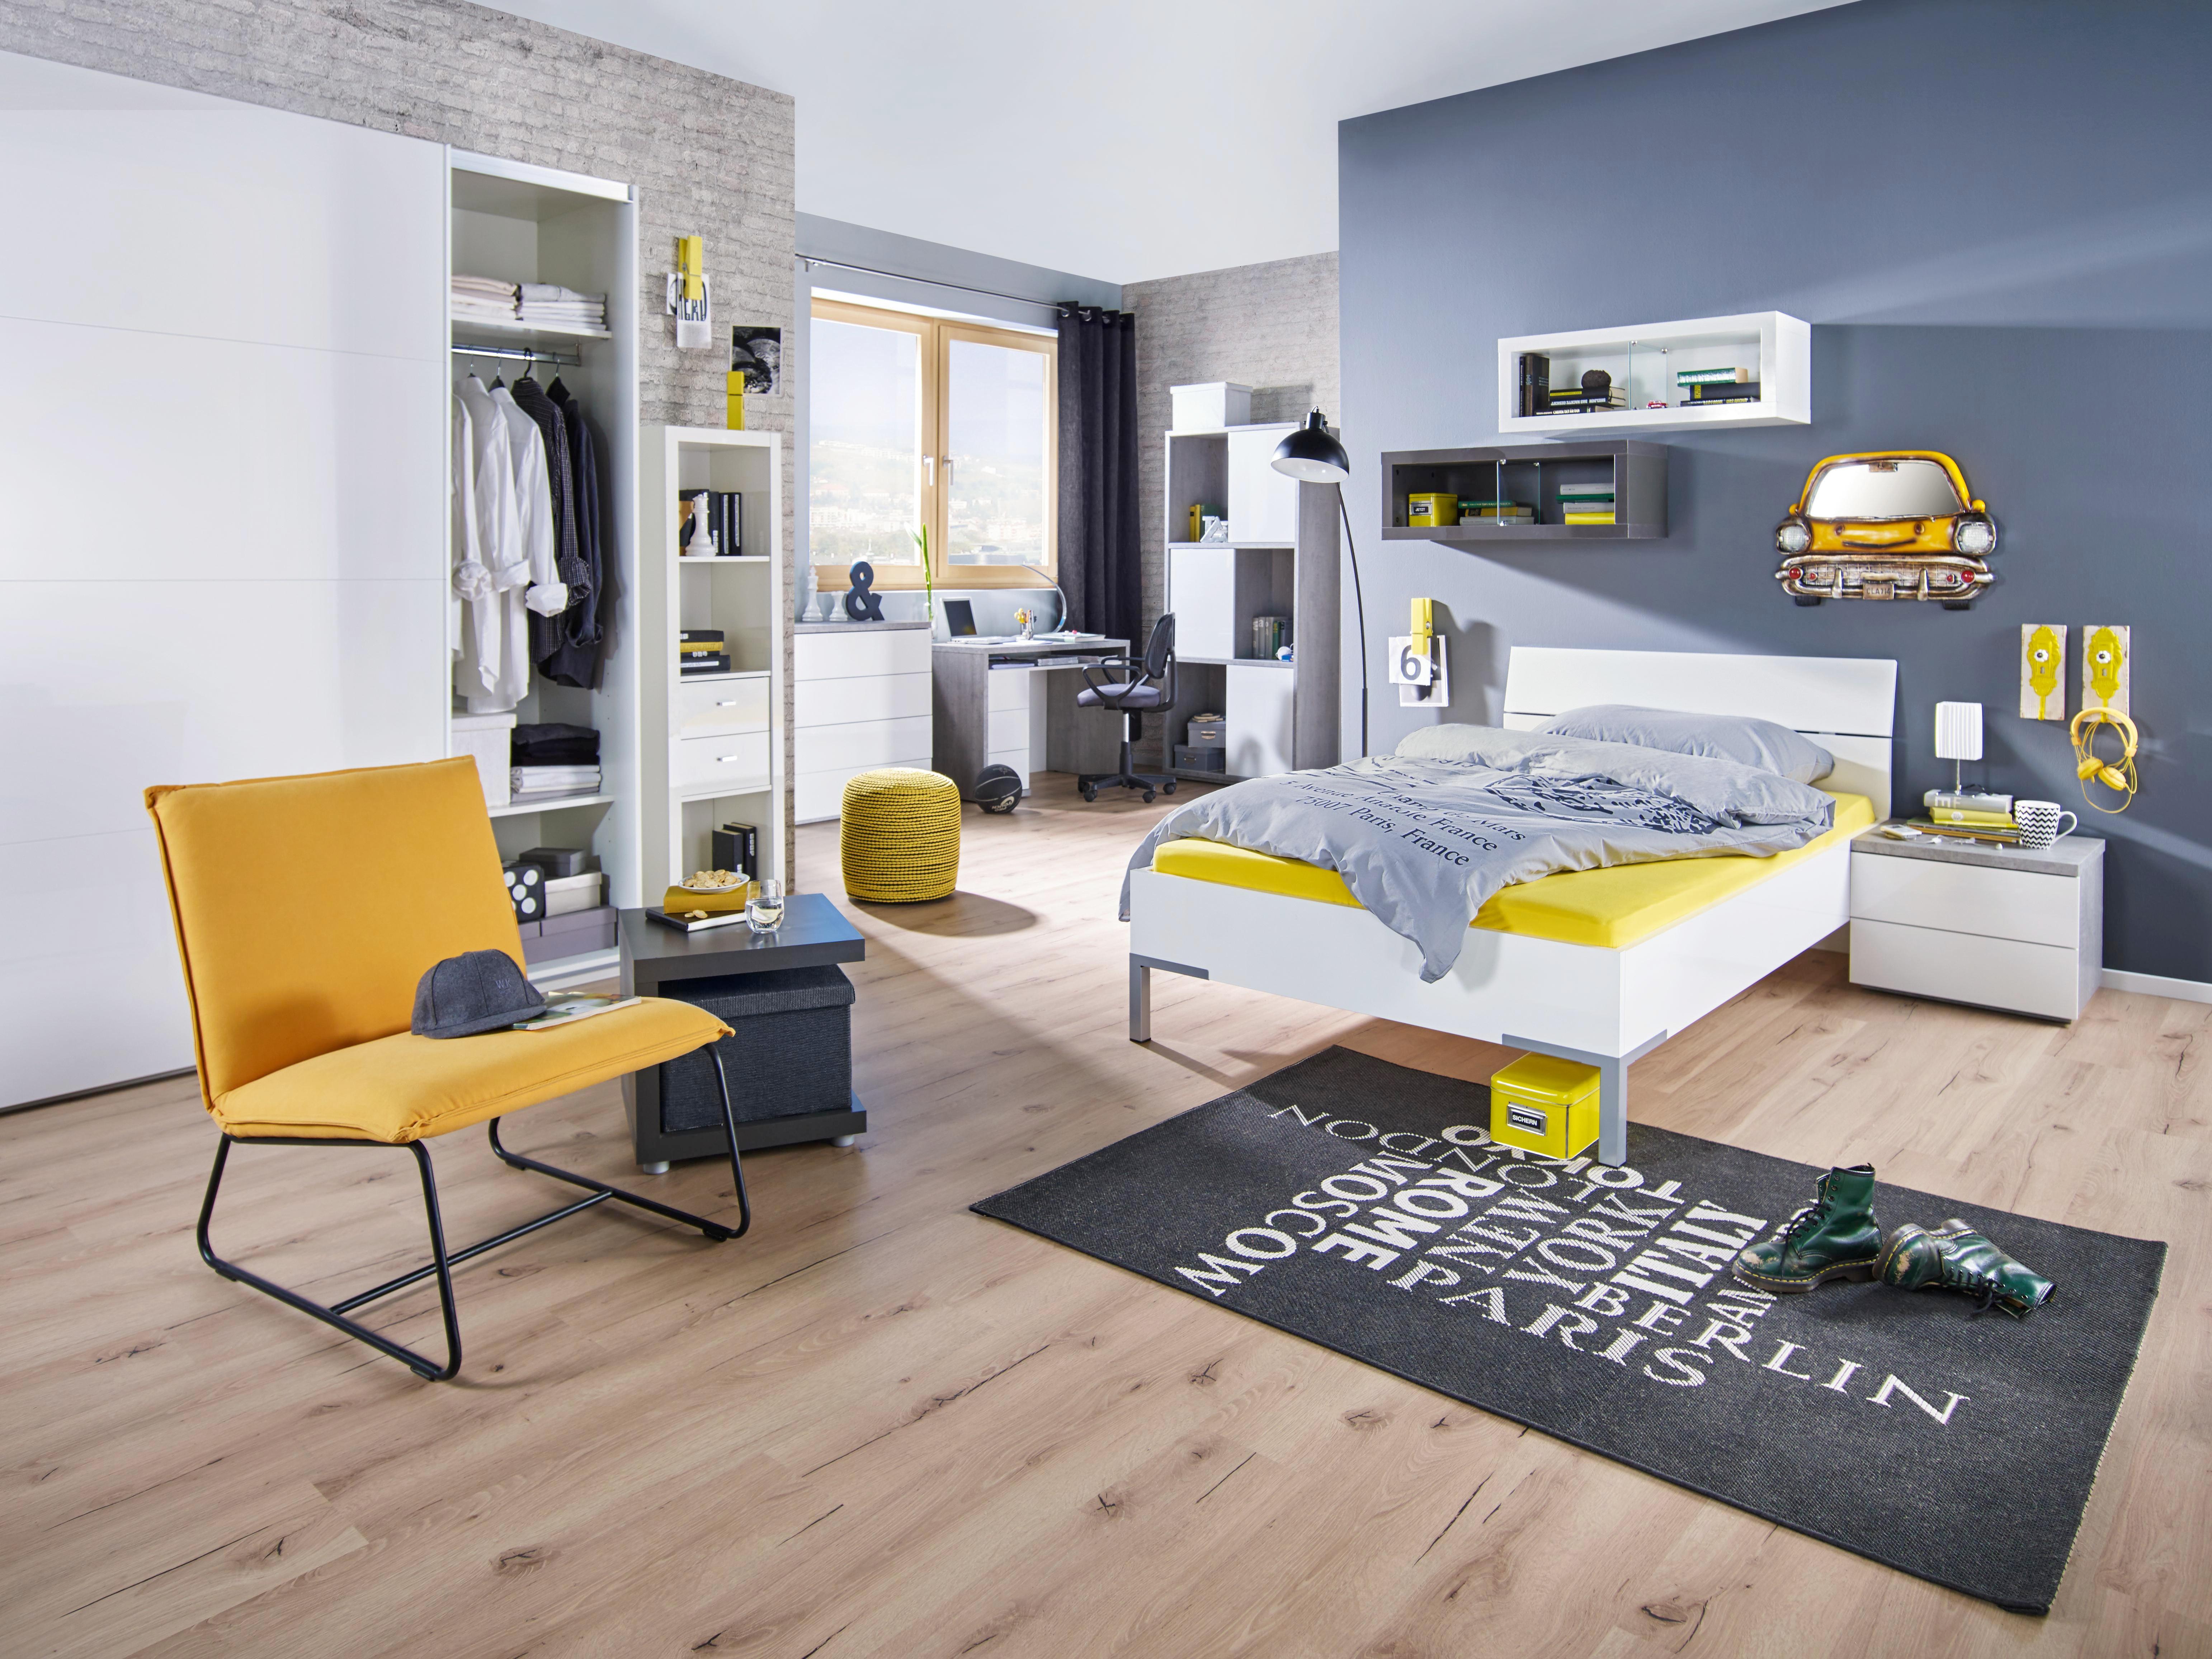 Kinder-/Juniorbett in Weiß ca. 140x200cm - (146/86,5/211,8cm) - MODERN LIVING